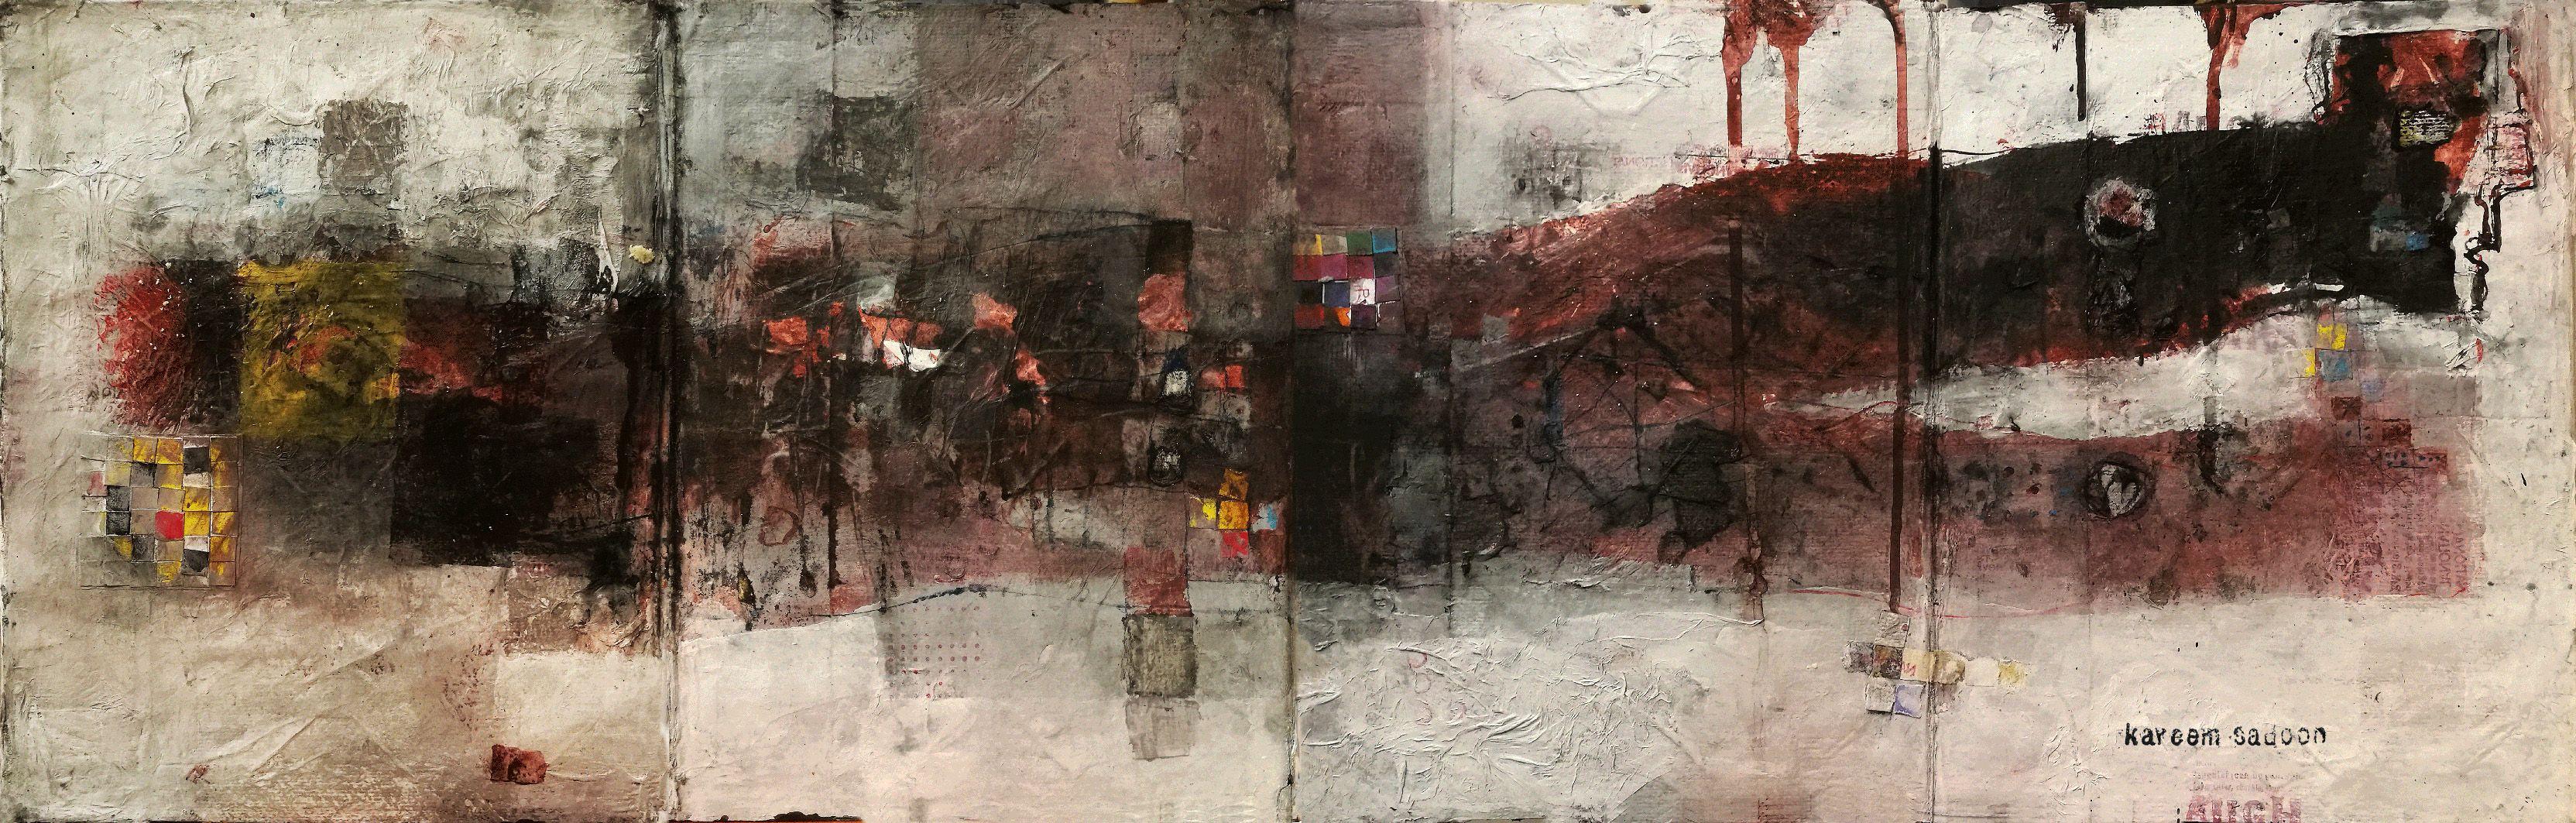 35x190cm Mixed media ov handmade paper 2017